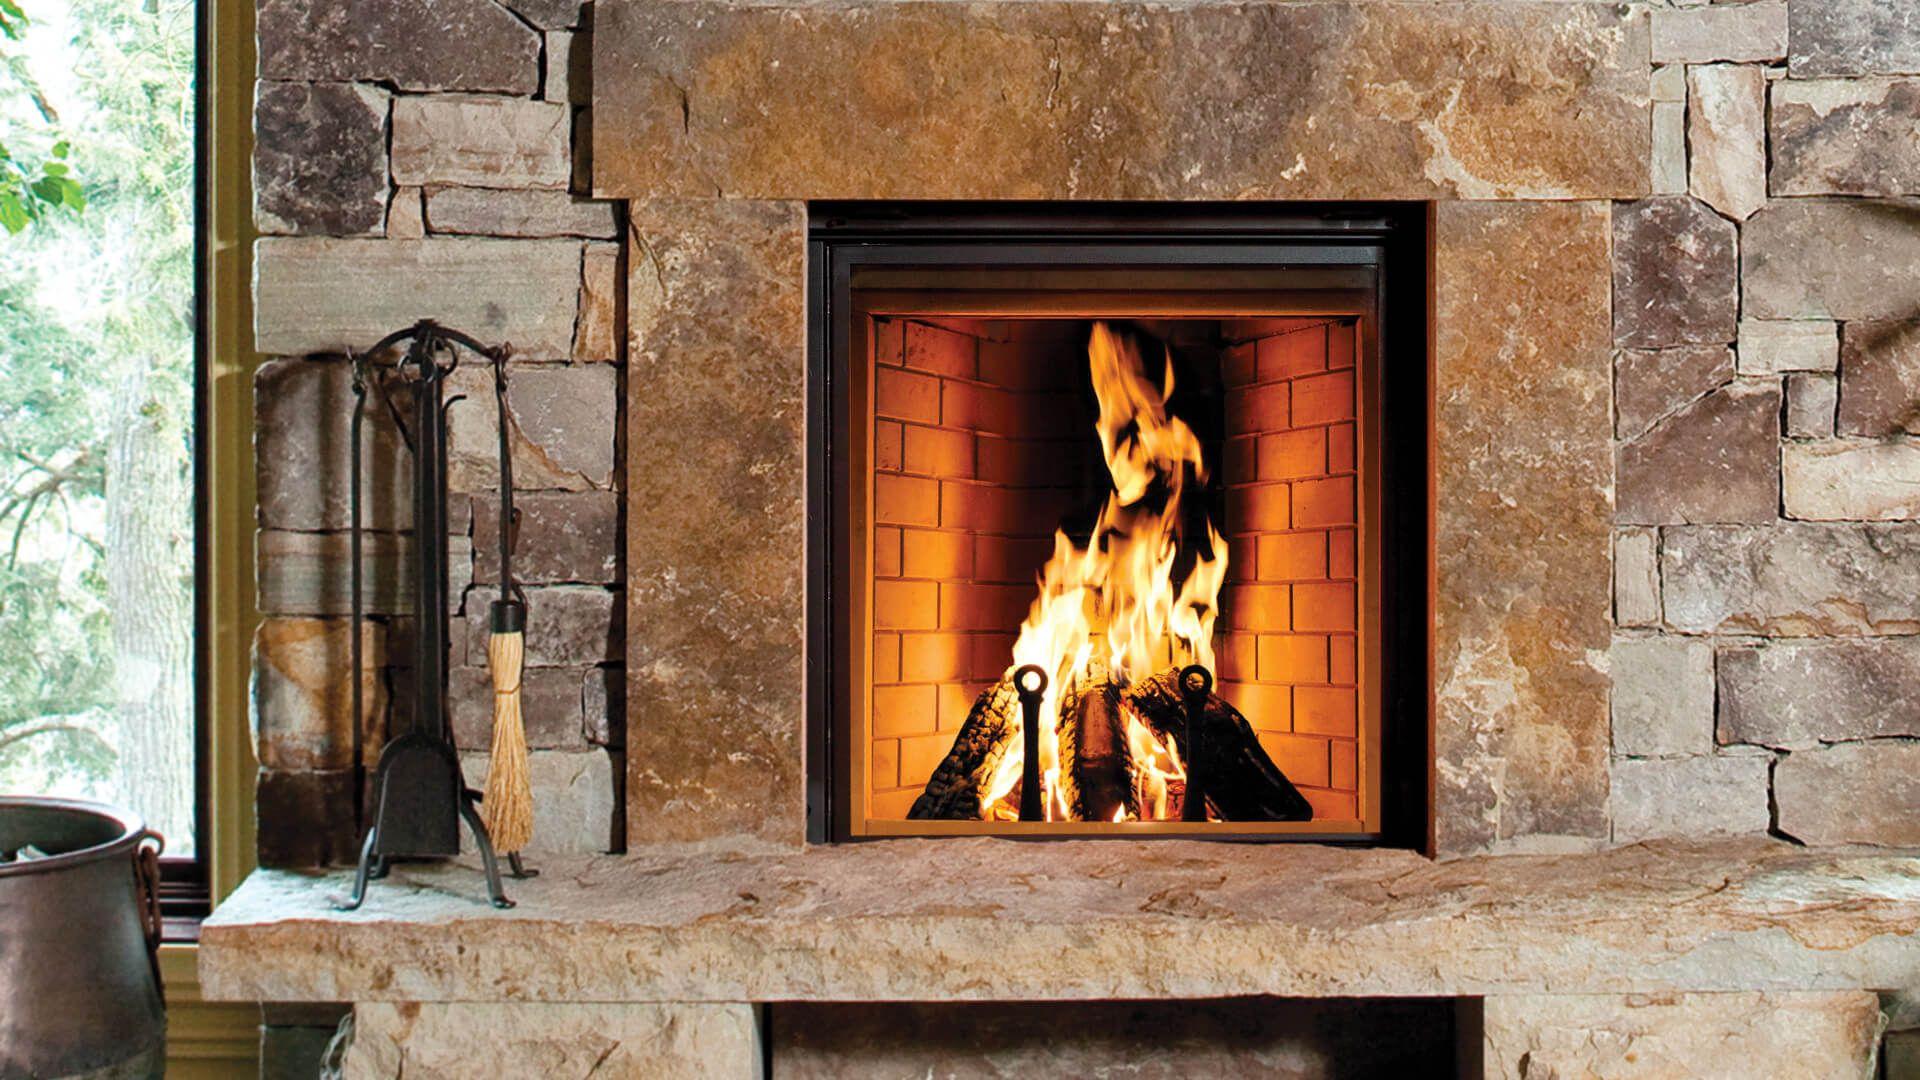 Rumford 1000 Renaissance Fireplaces Fireplace Rumford